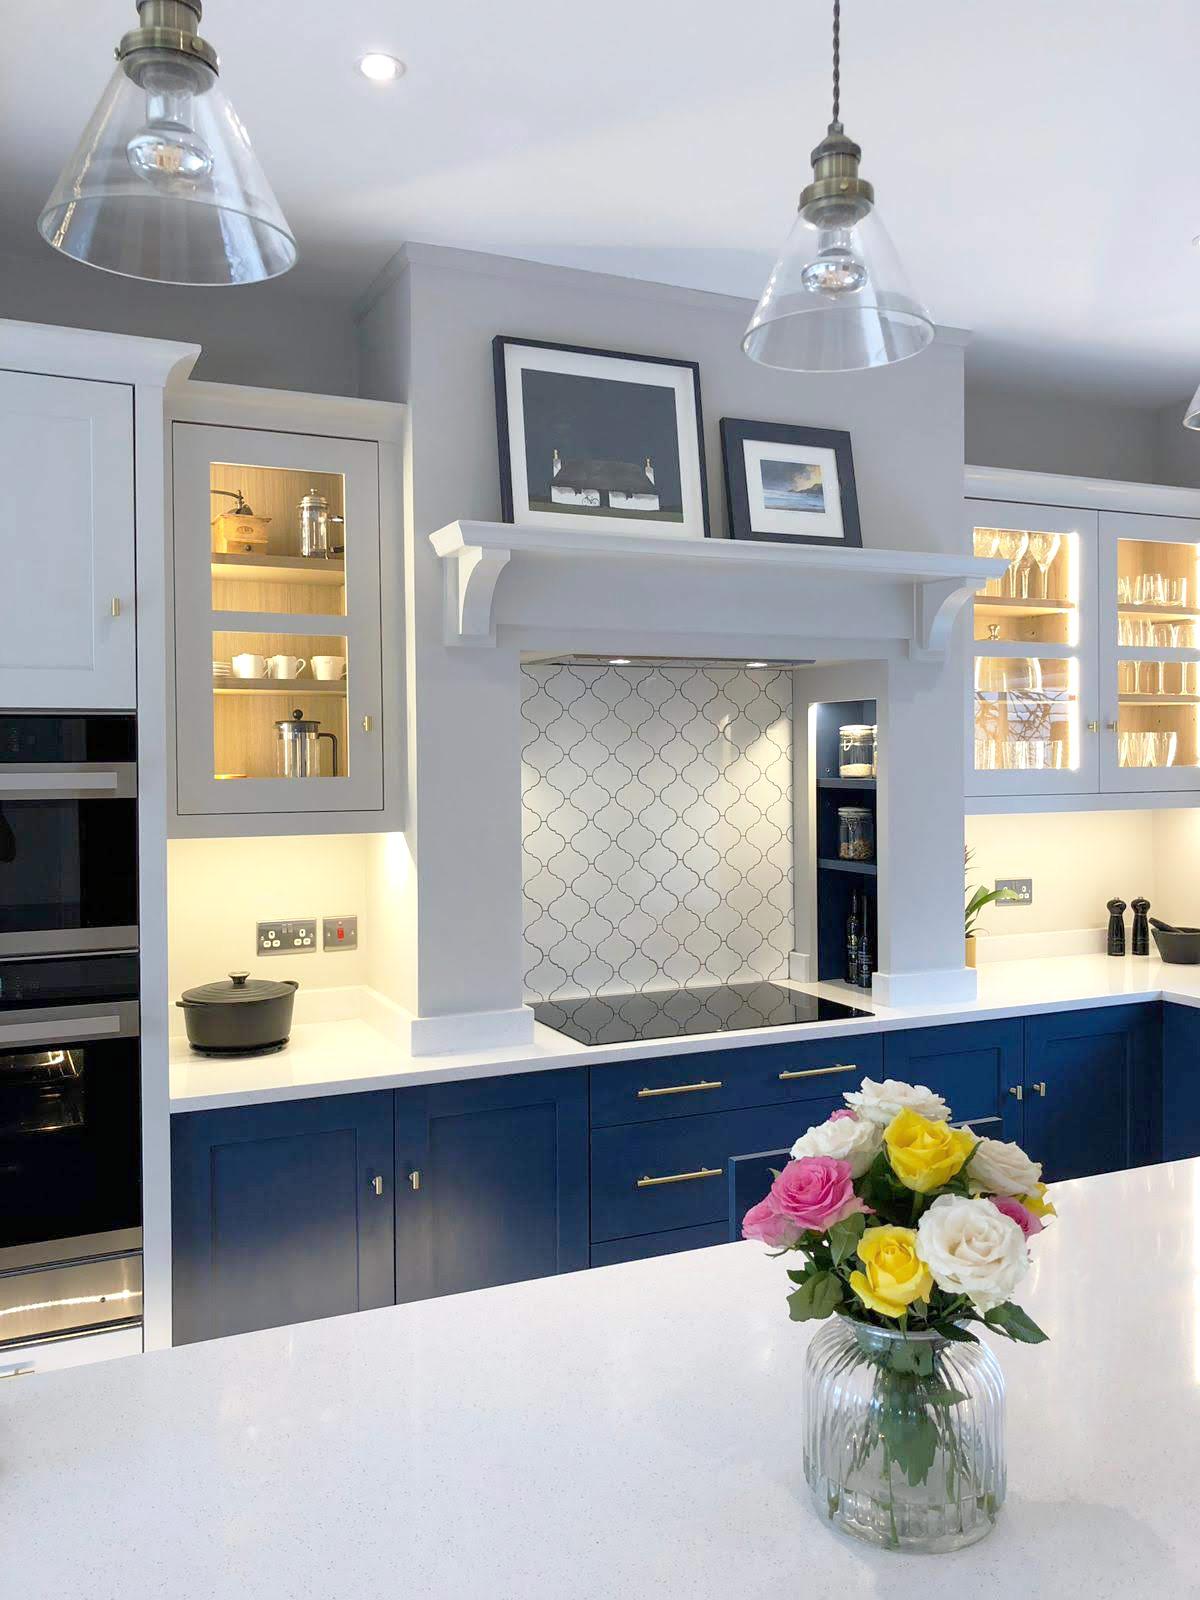 Bespoke Kitchen Mantle